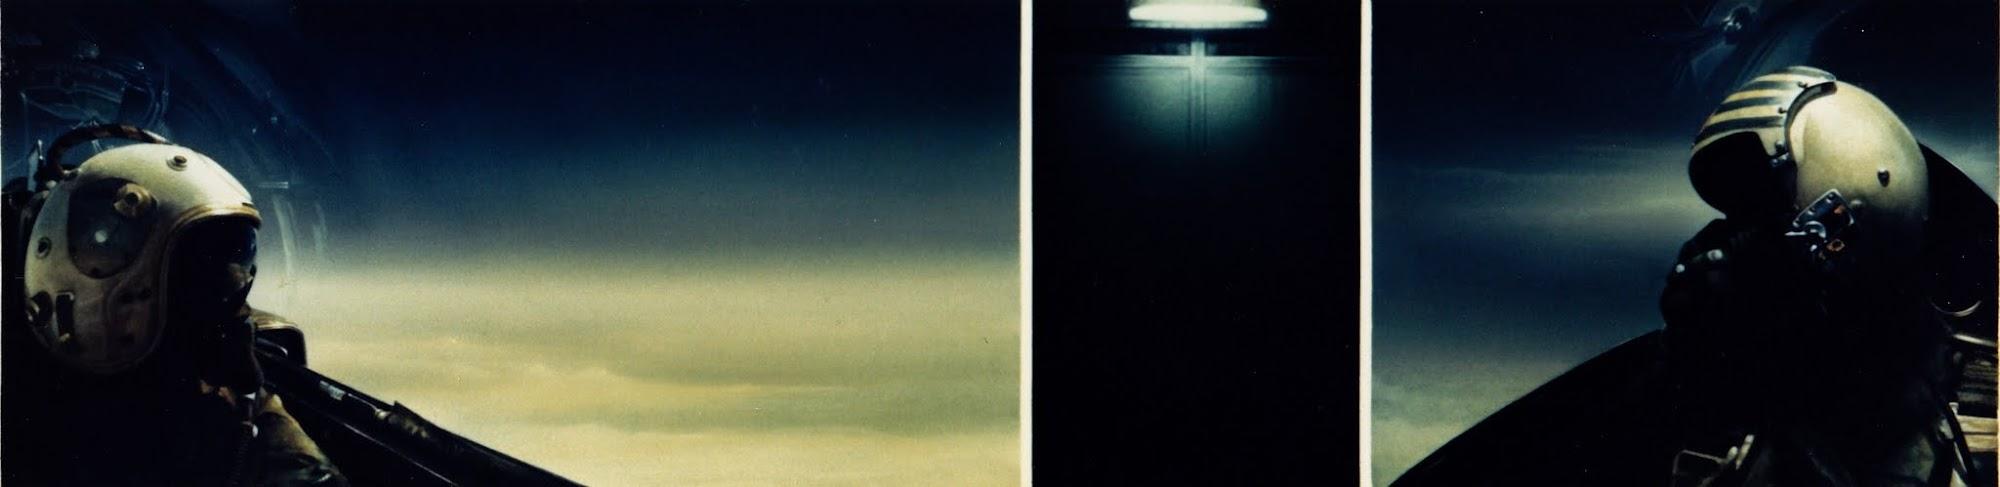 Verschlossenes Gefuehl 1989 Aquarell 35 x 135 cm